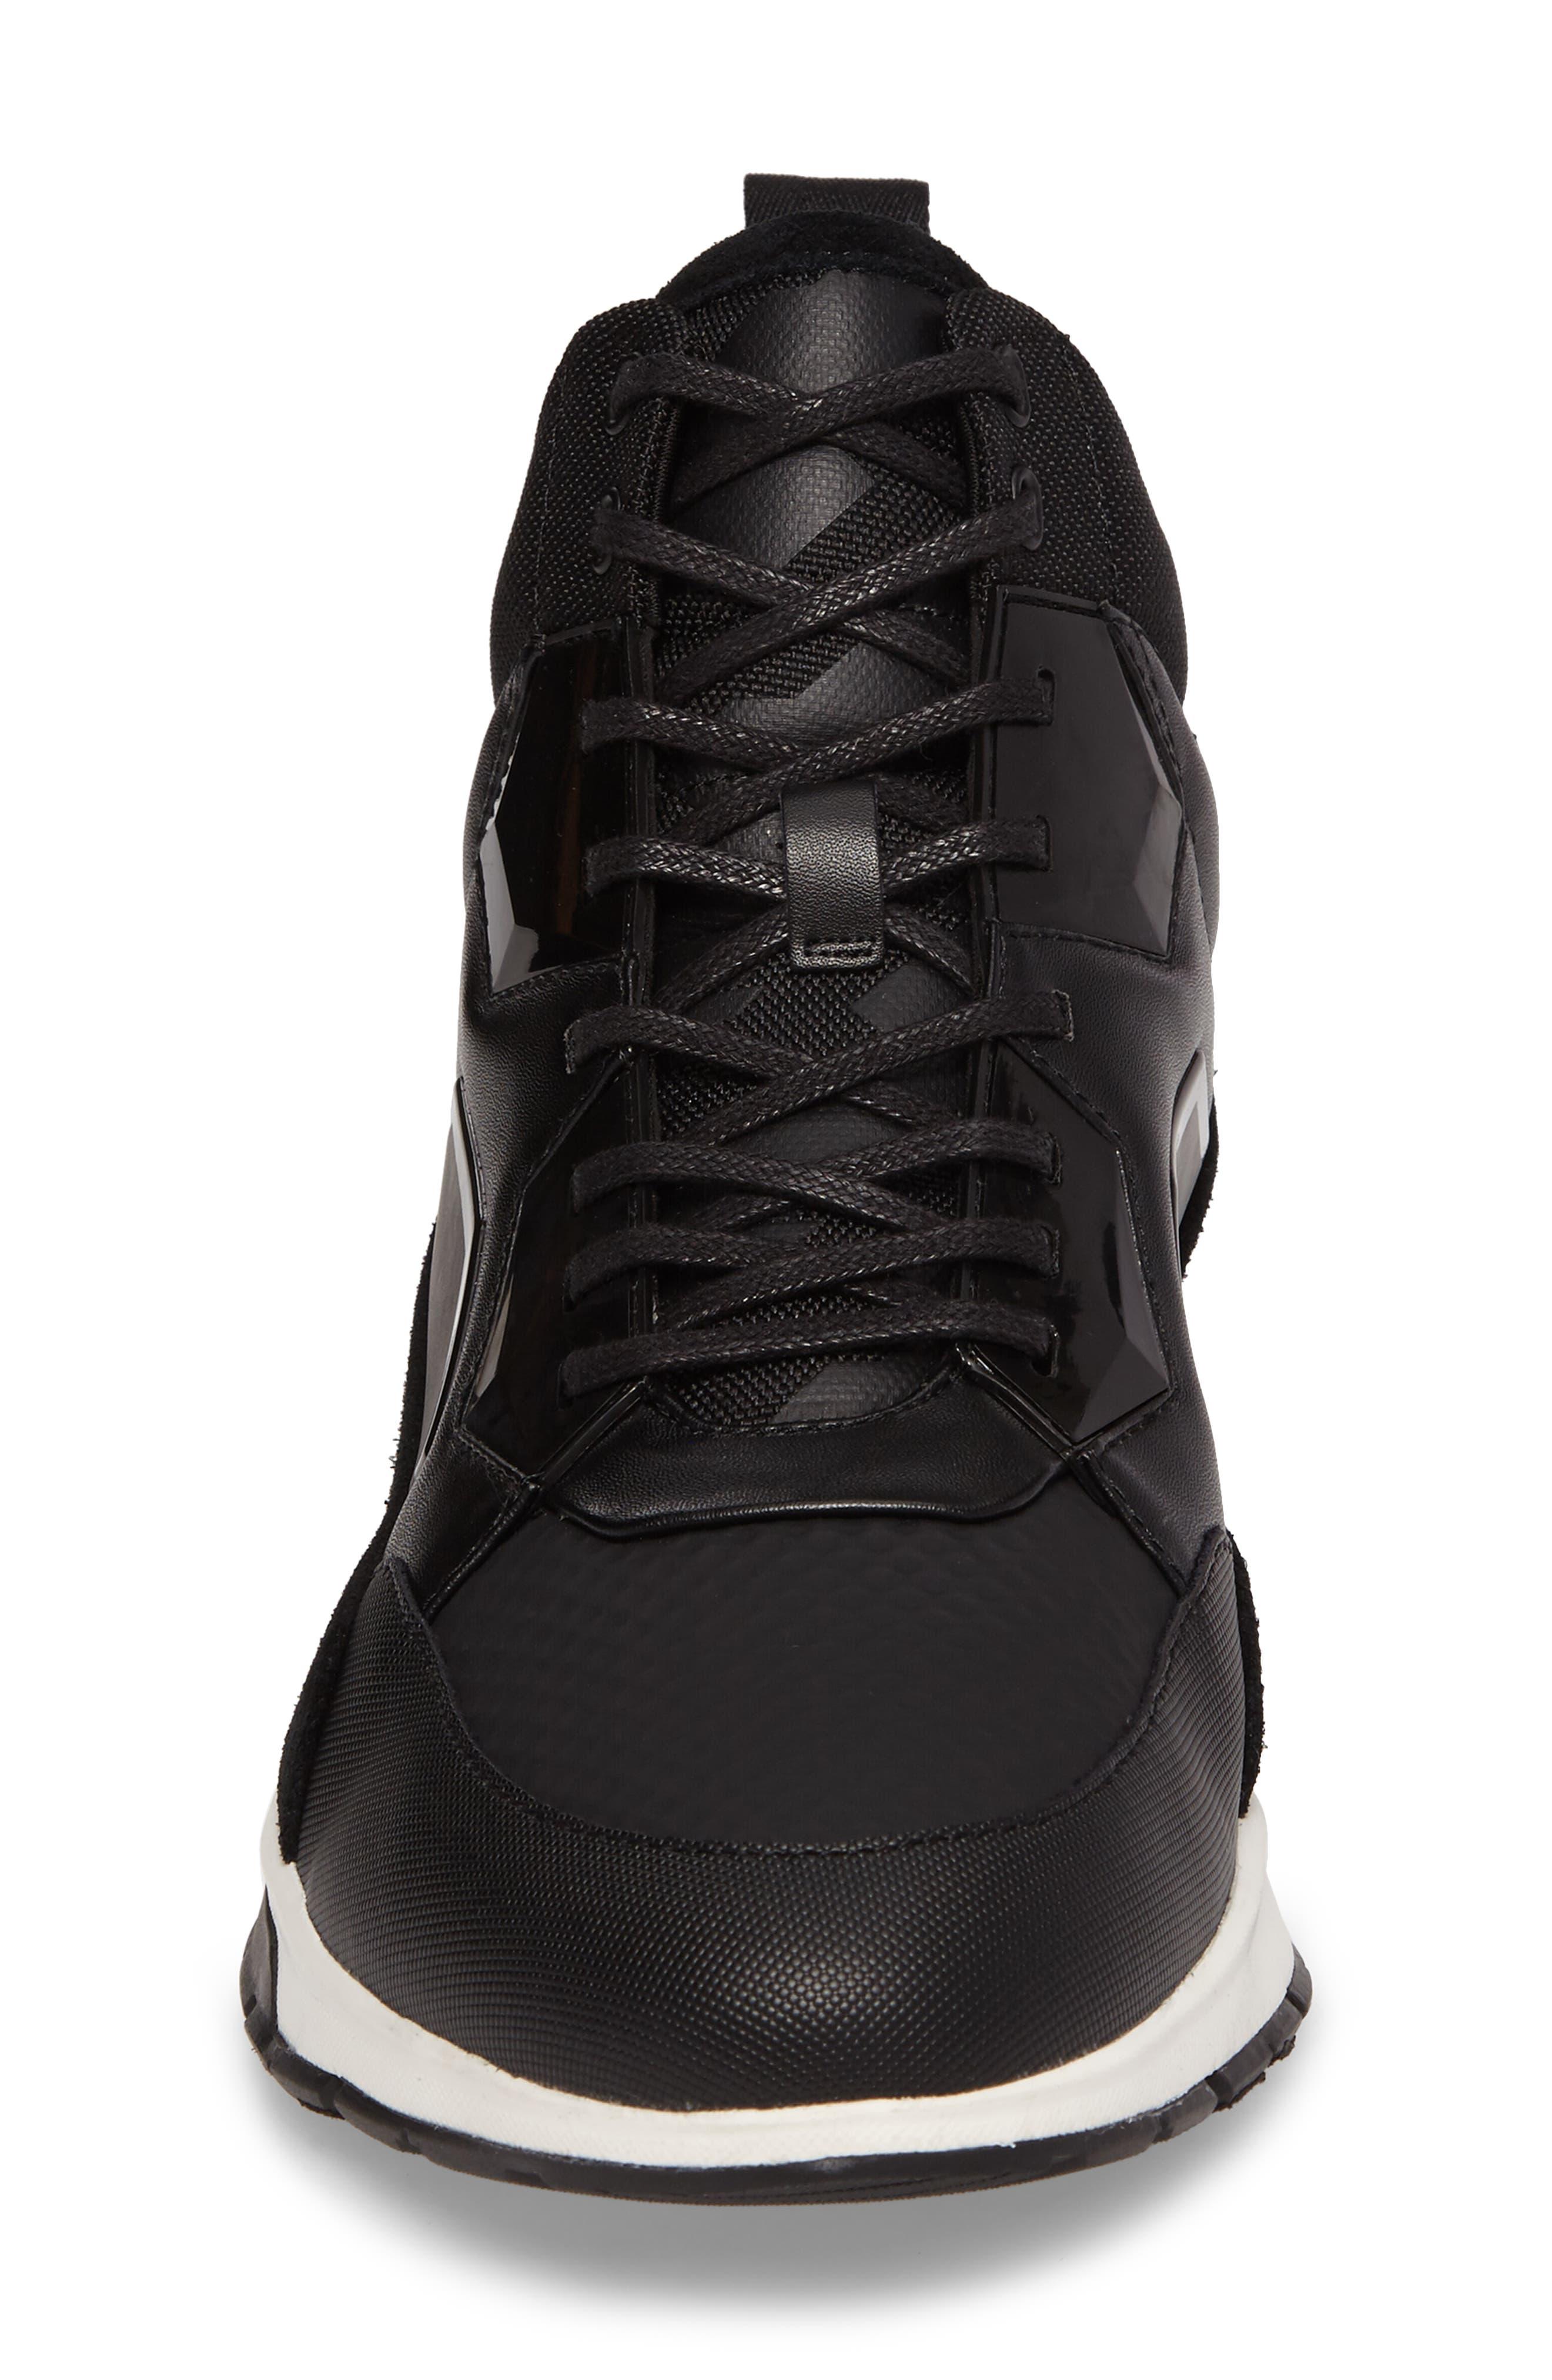 Kovan City Sneaker,                             Alternate thumbnail 4, color,                             001